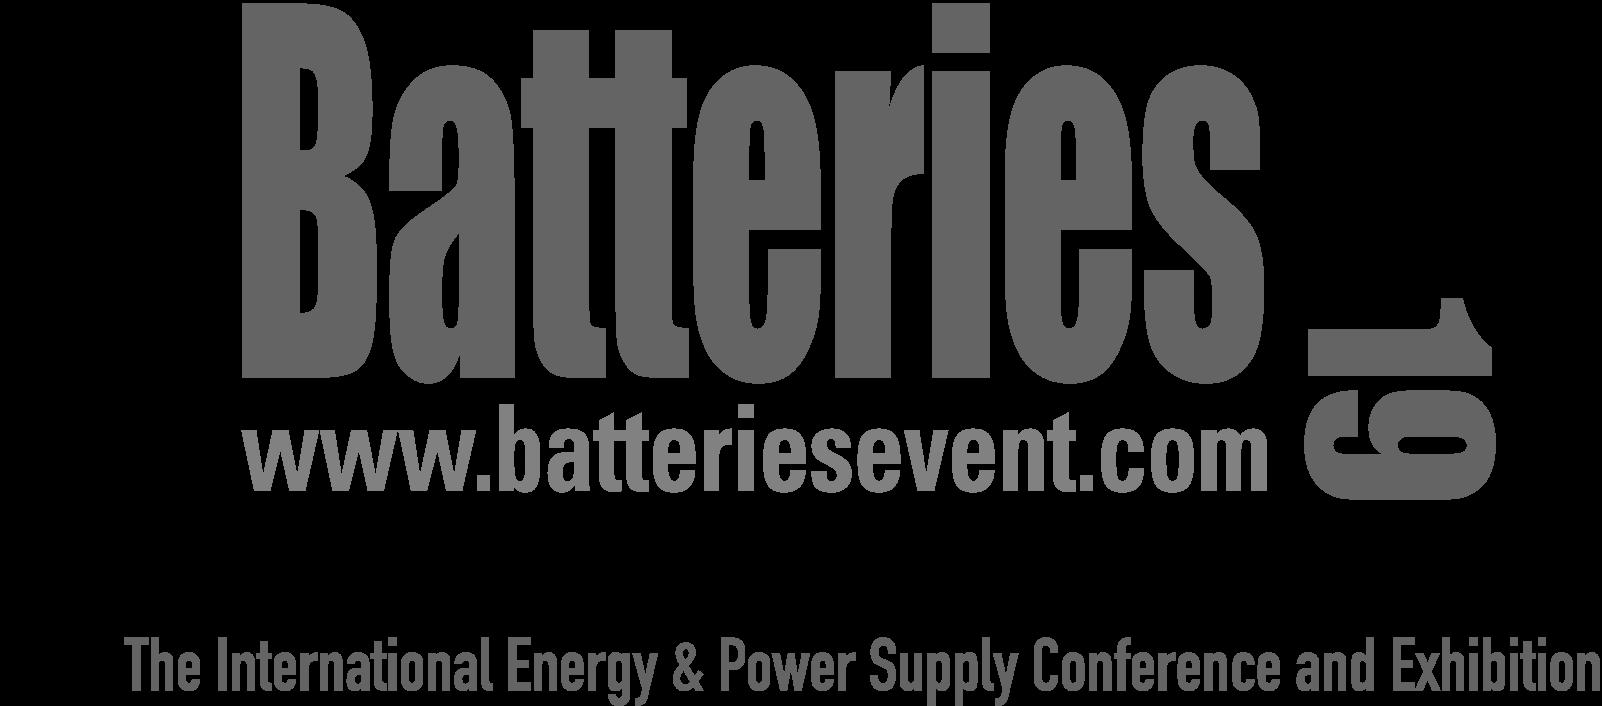 Batteries Event 2019